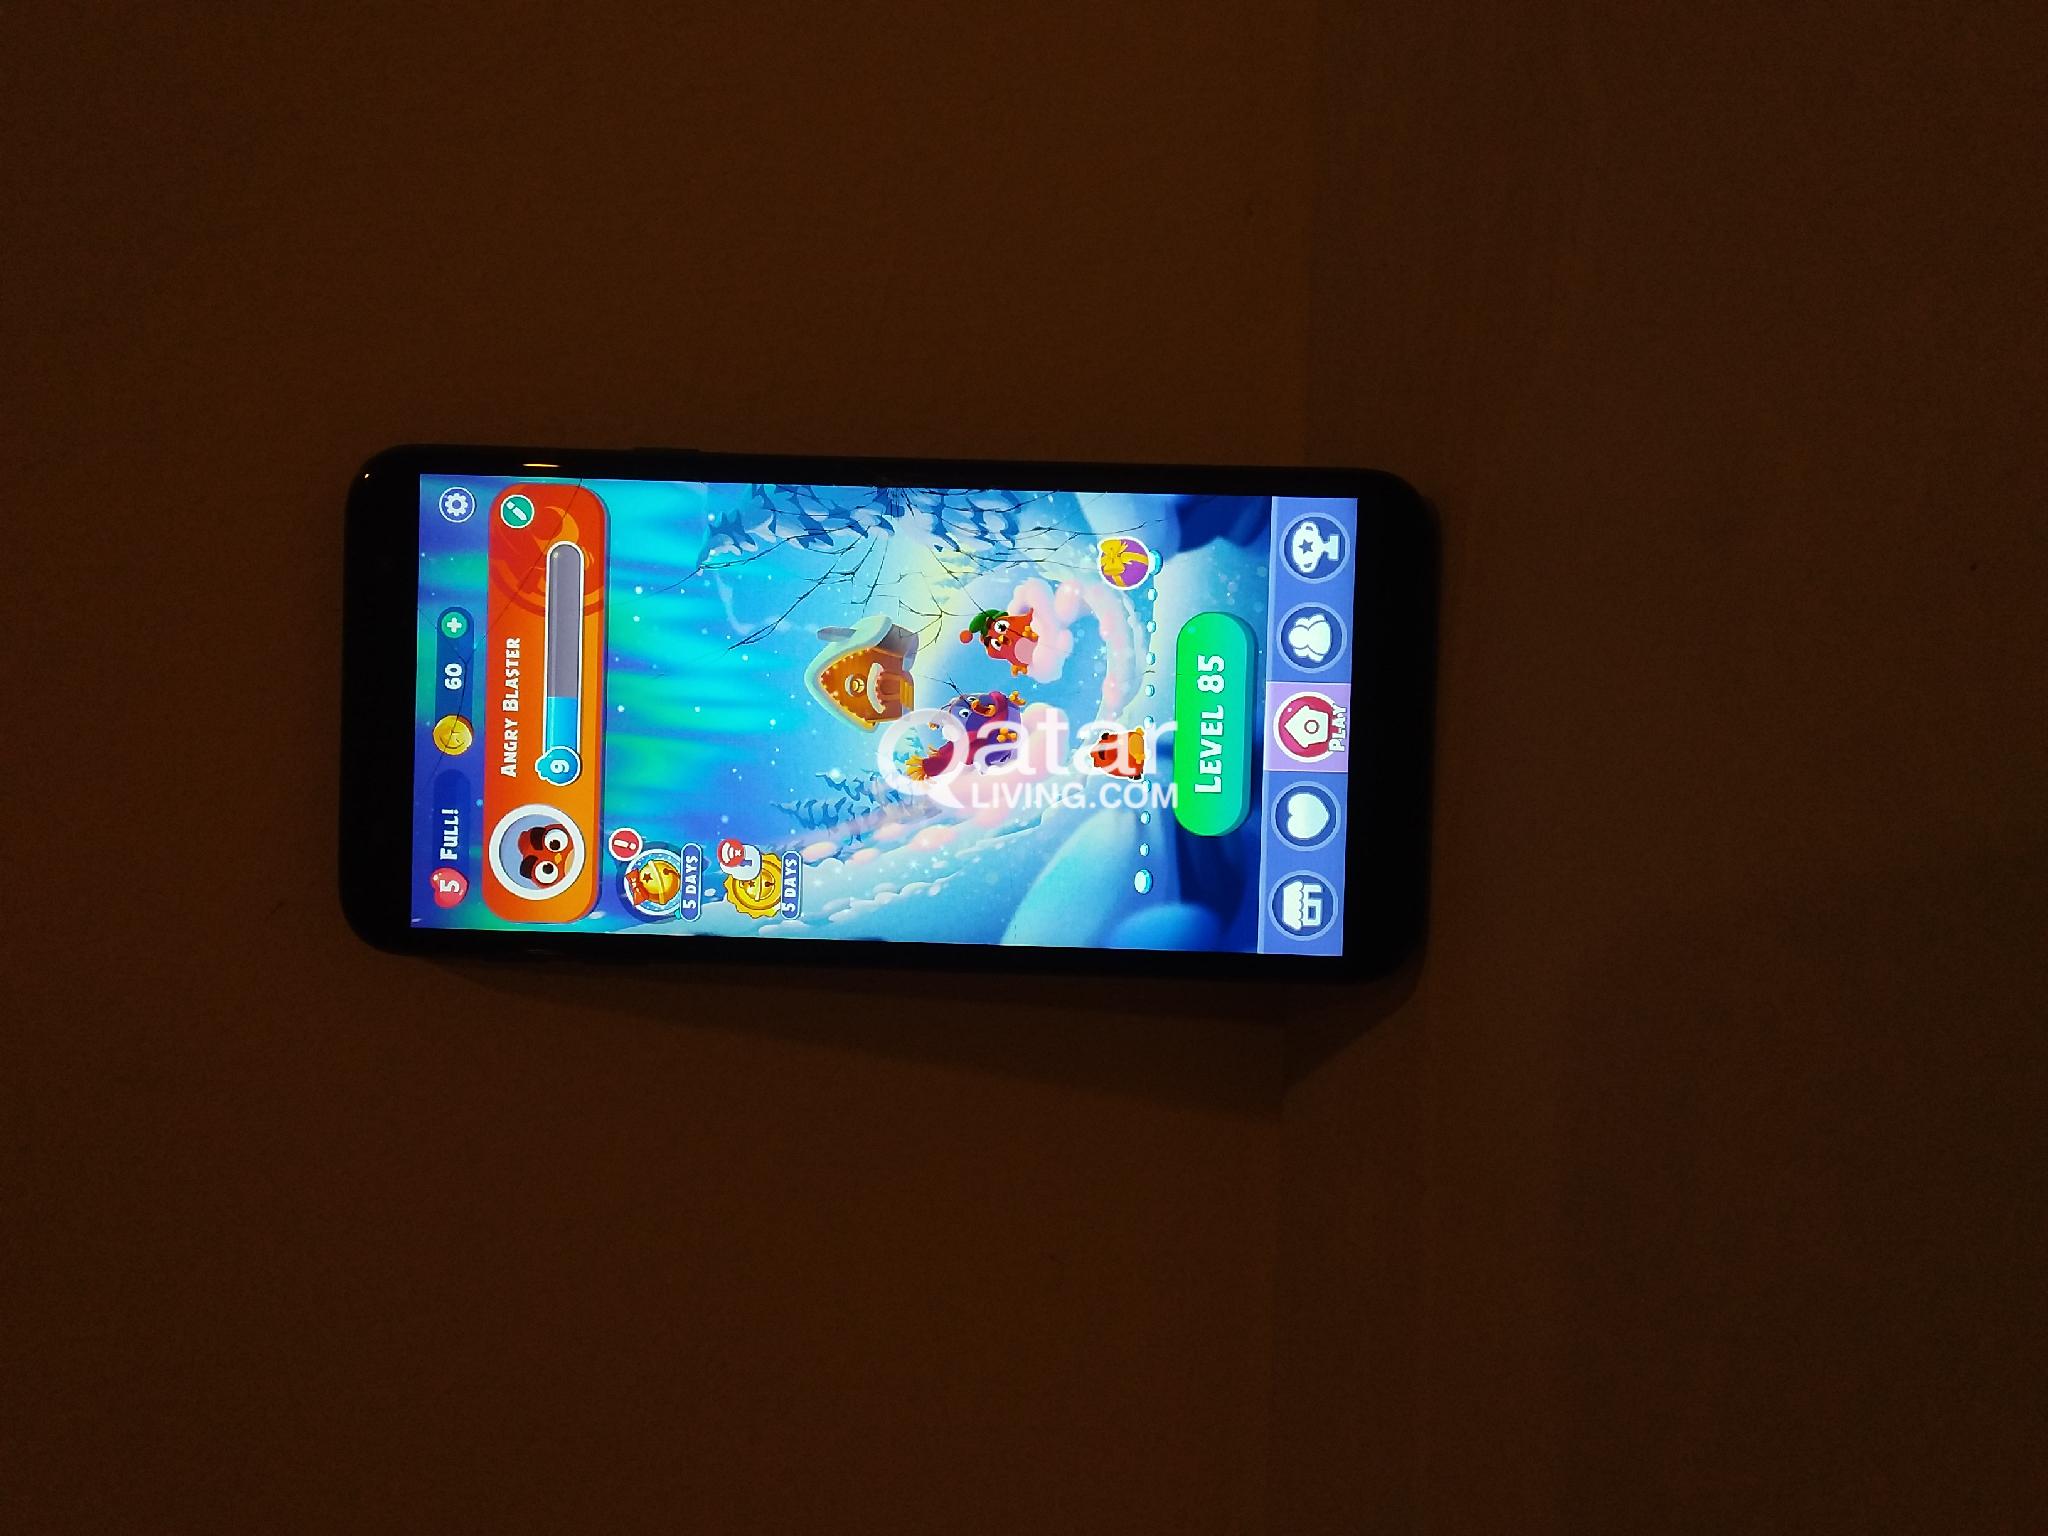 Samsung Galaxy J4 Core Qatar Living